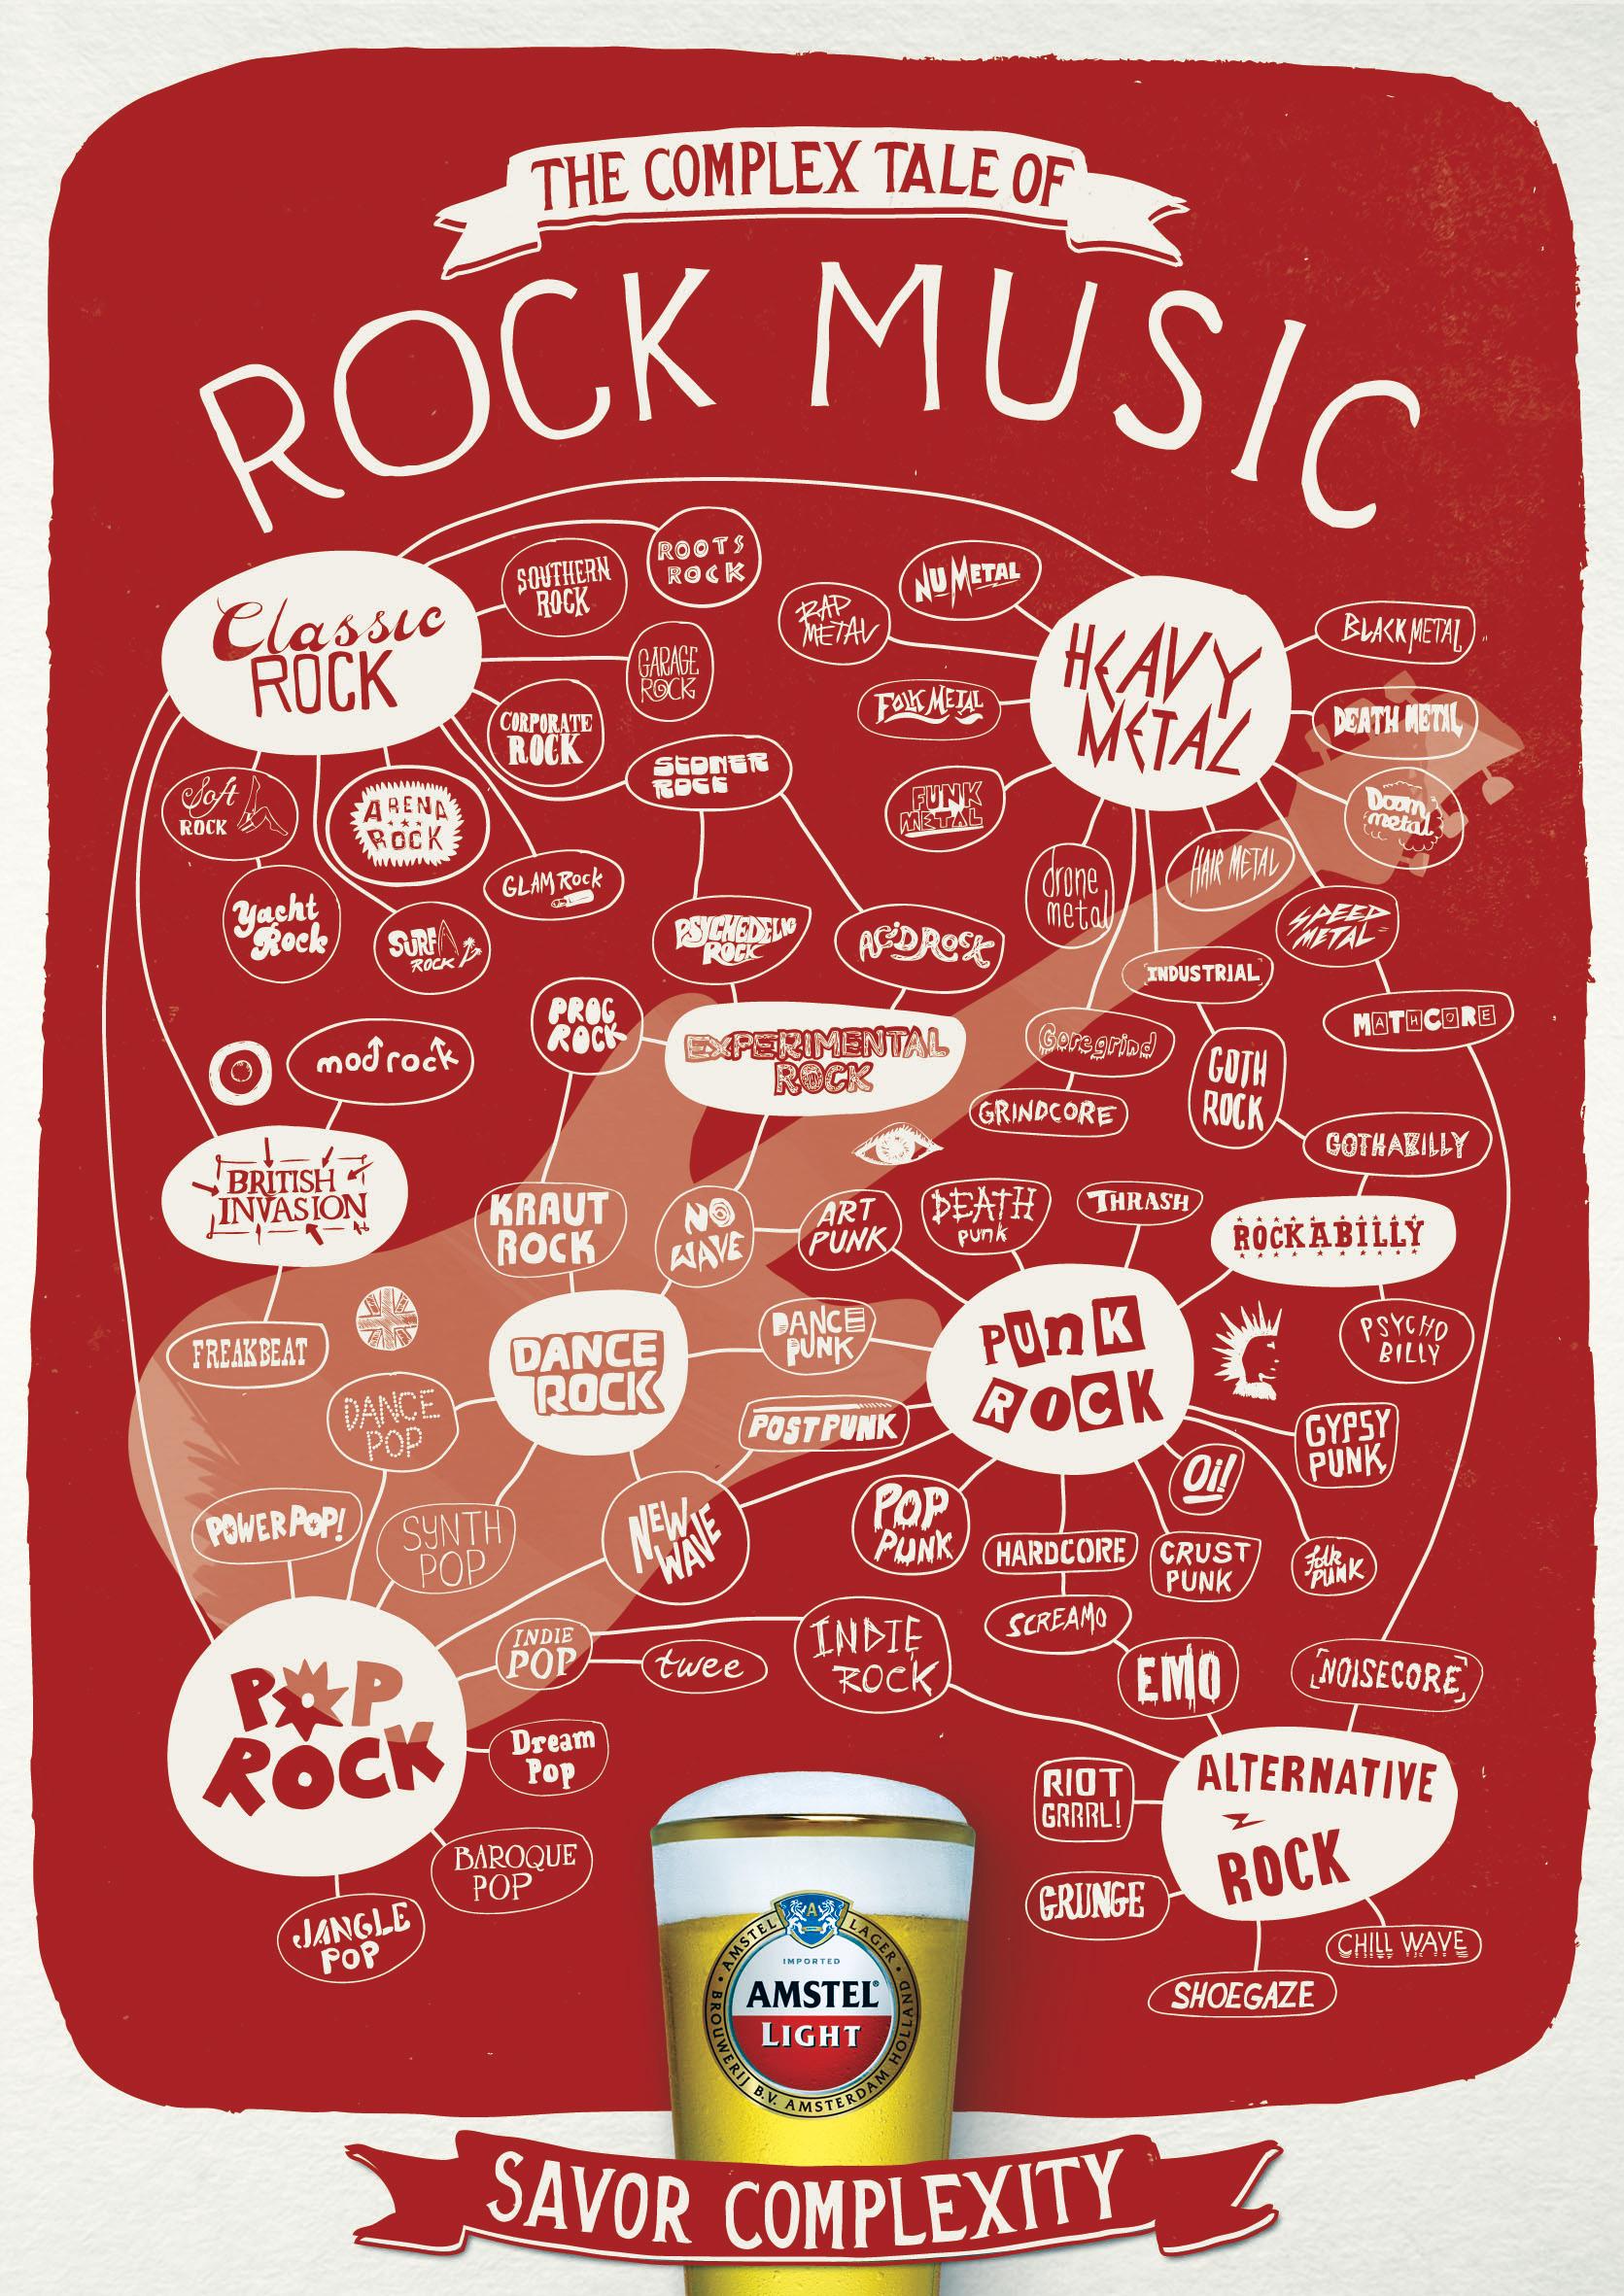 rock music definition